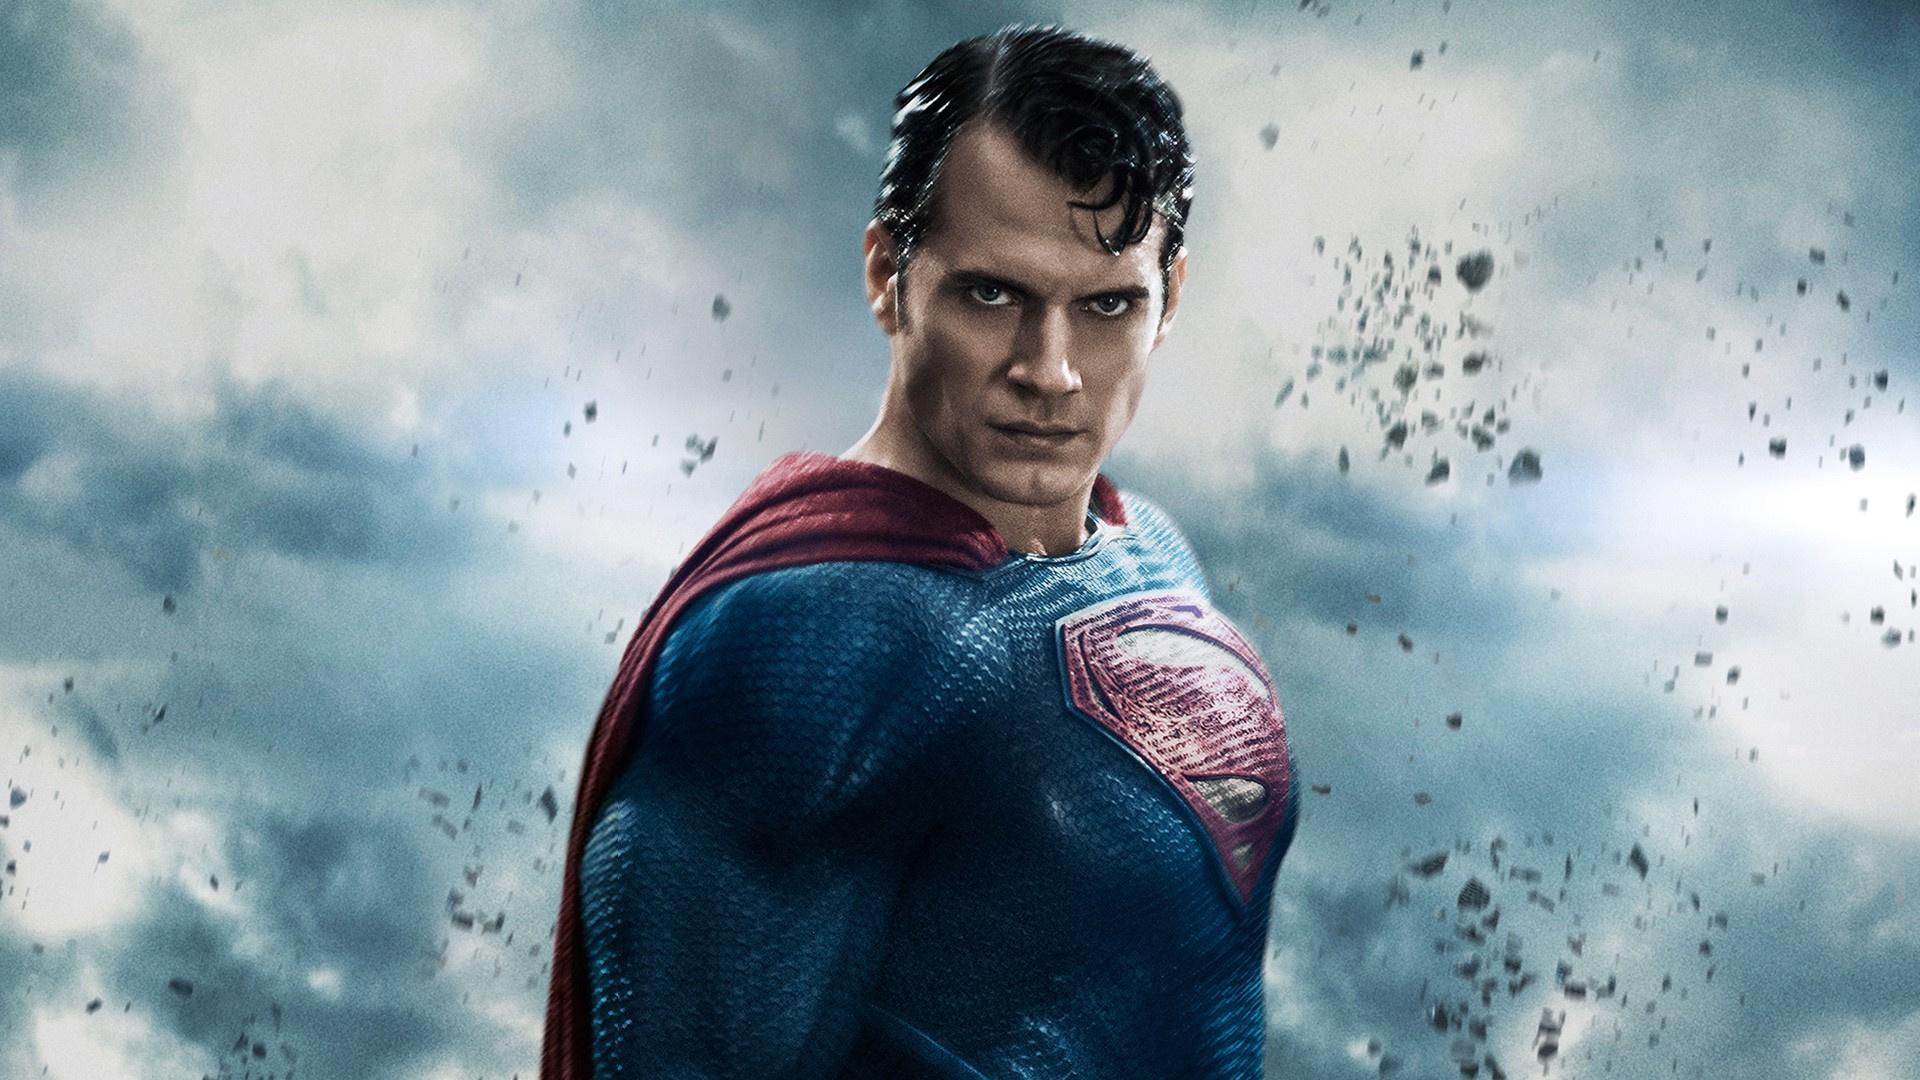 Джеймс Ганн мог снять новый фильм про Супермена вместо «Отряда самоубийц»